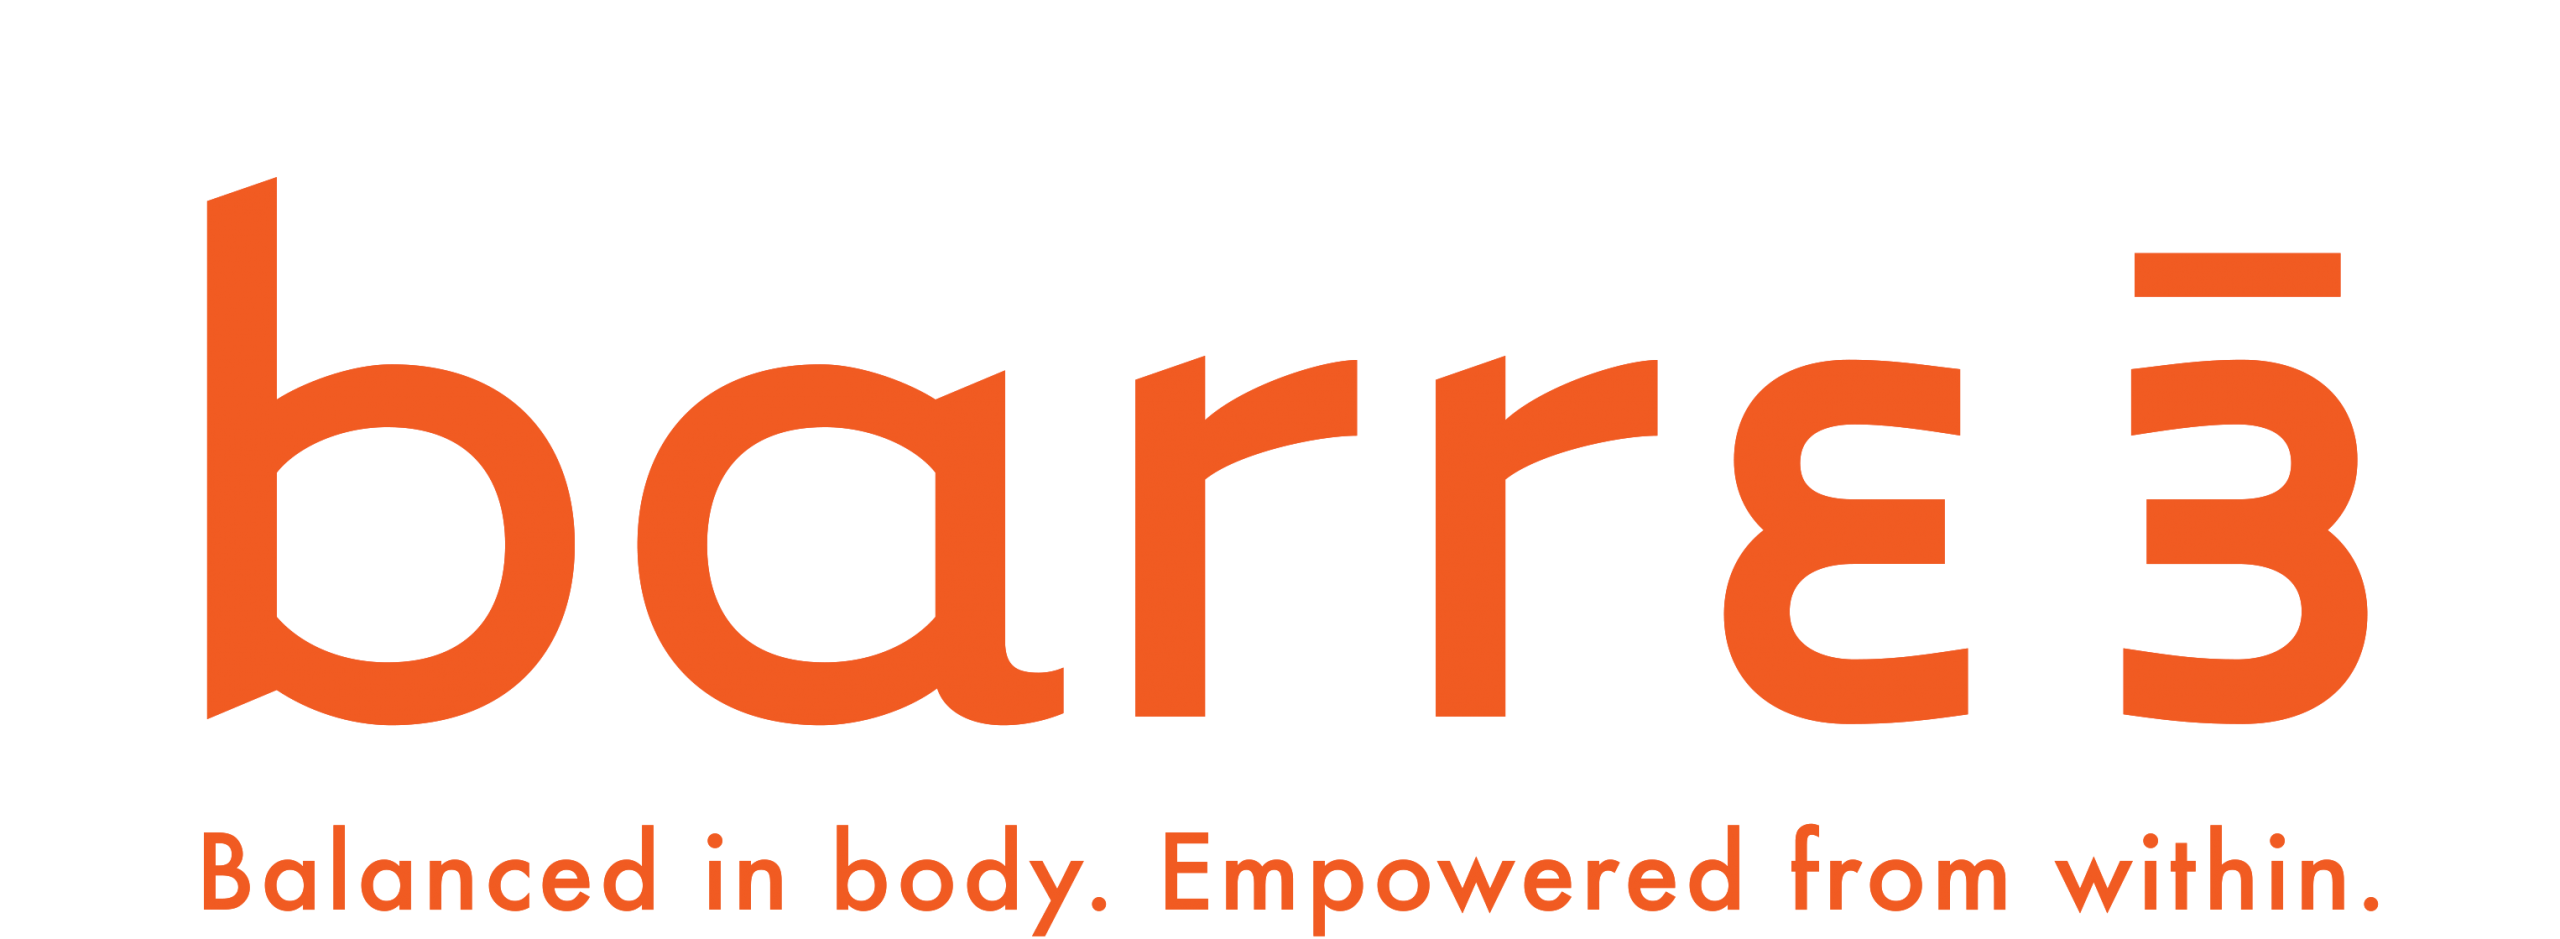 Barre logo